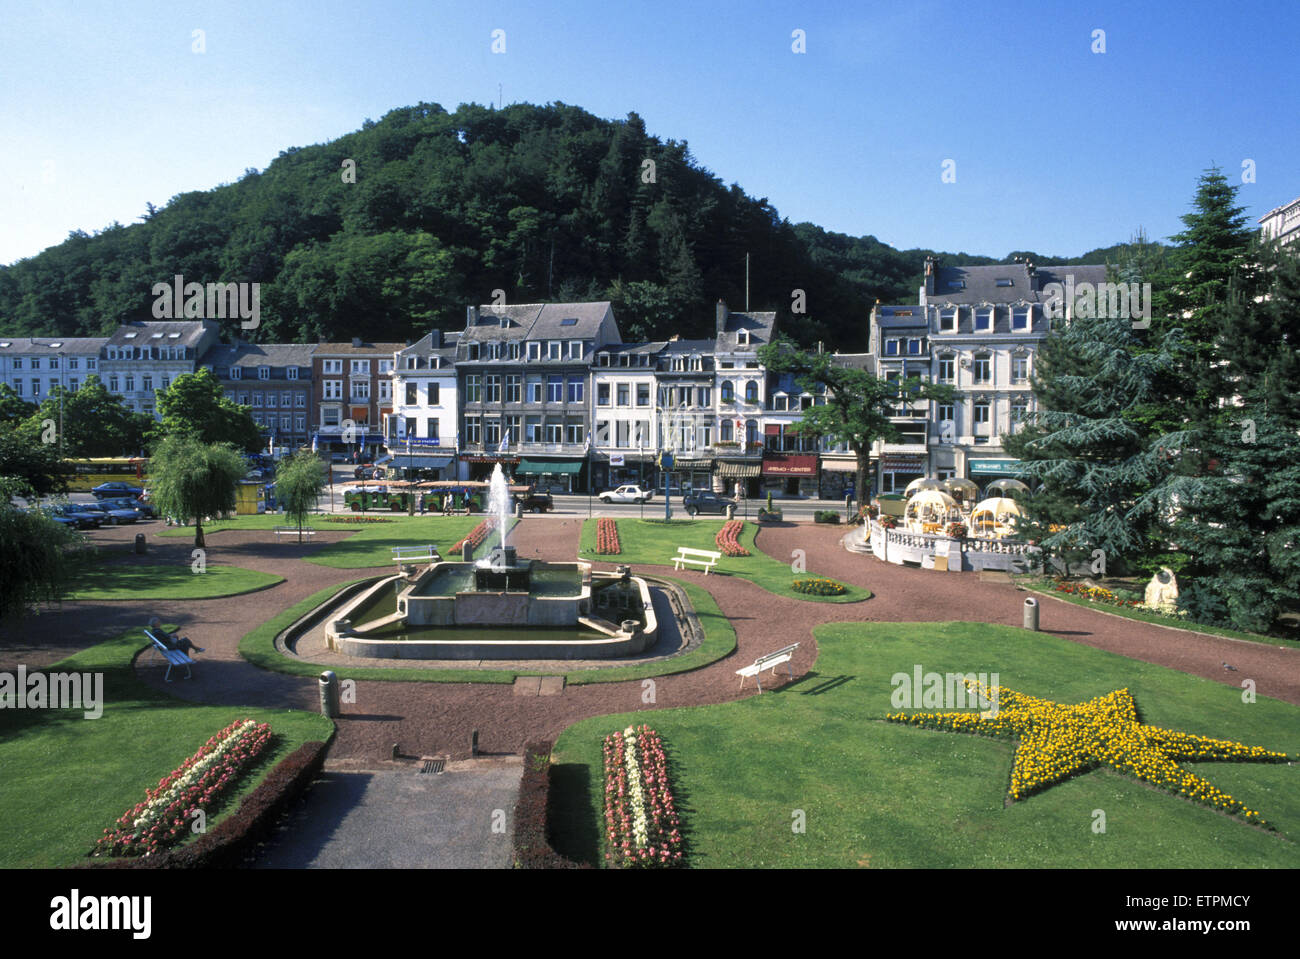 Bel Belgien Spa Casino Garten Bel Belgien Spa Der